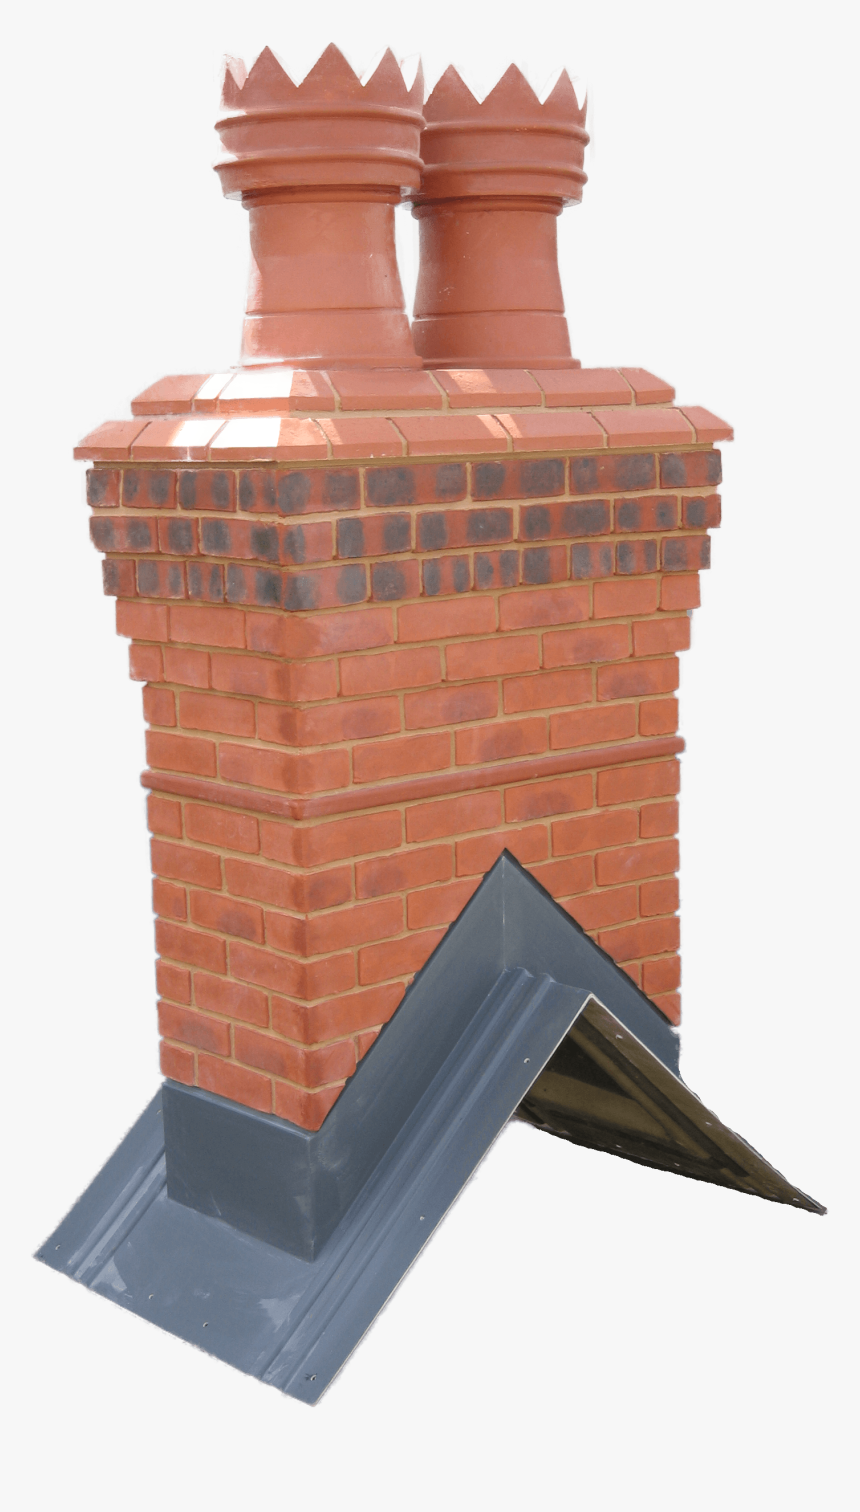 Brickwork, HD Png Download, Free Download